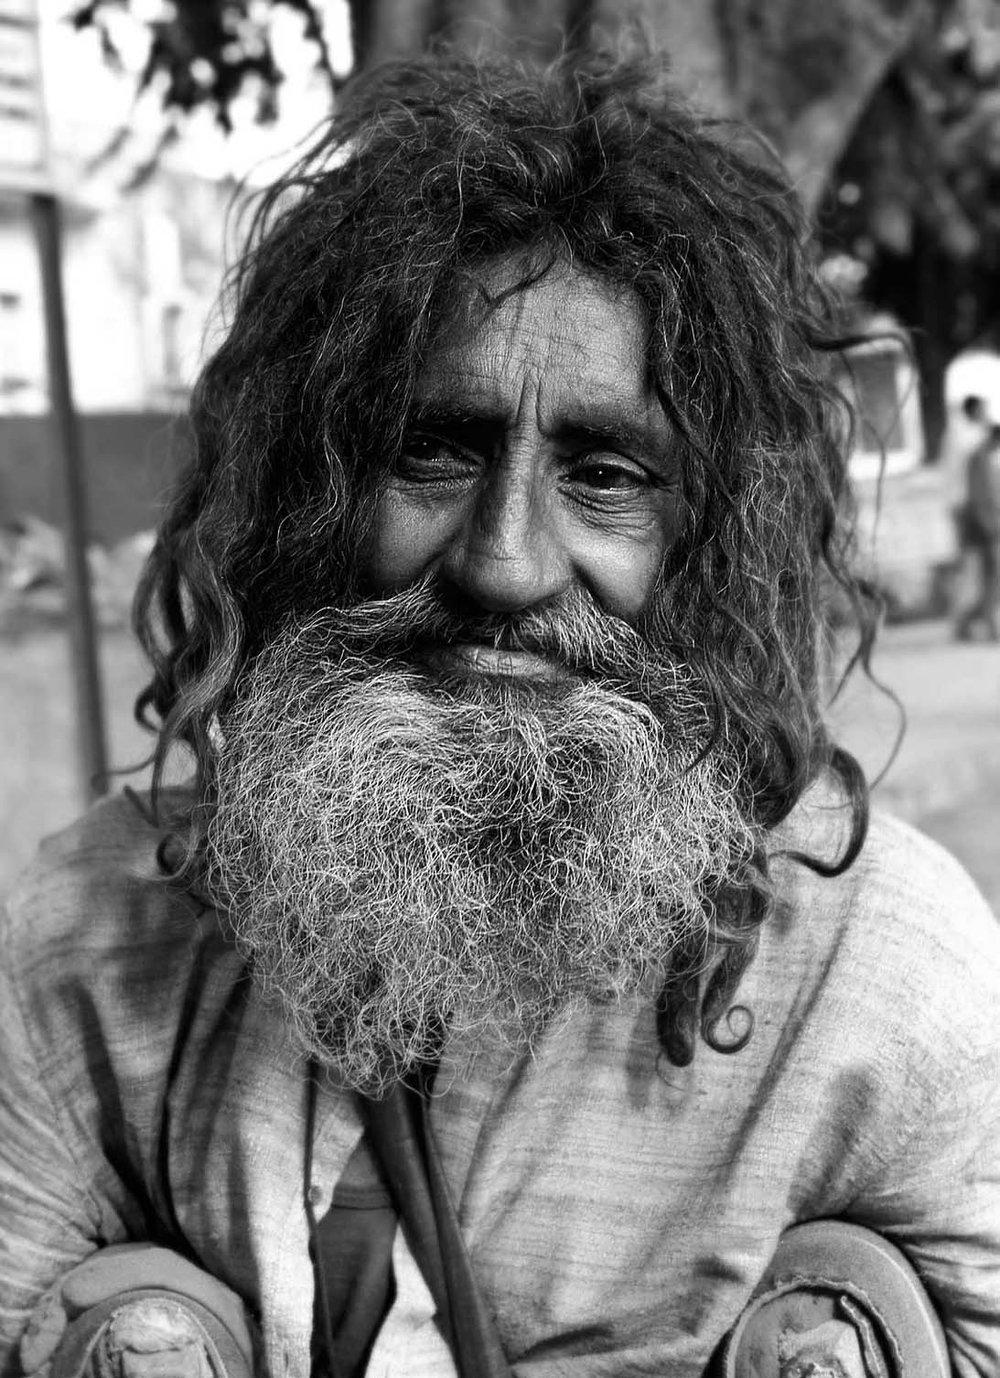 Leper India